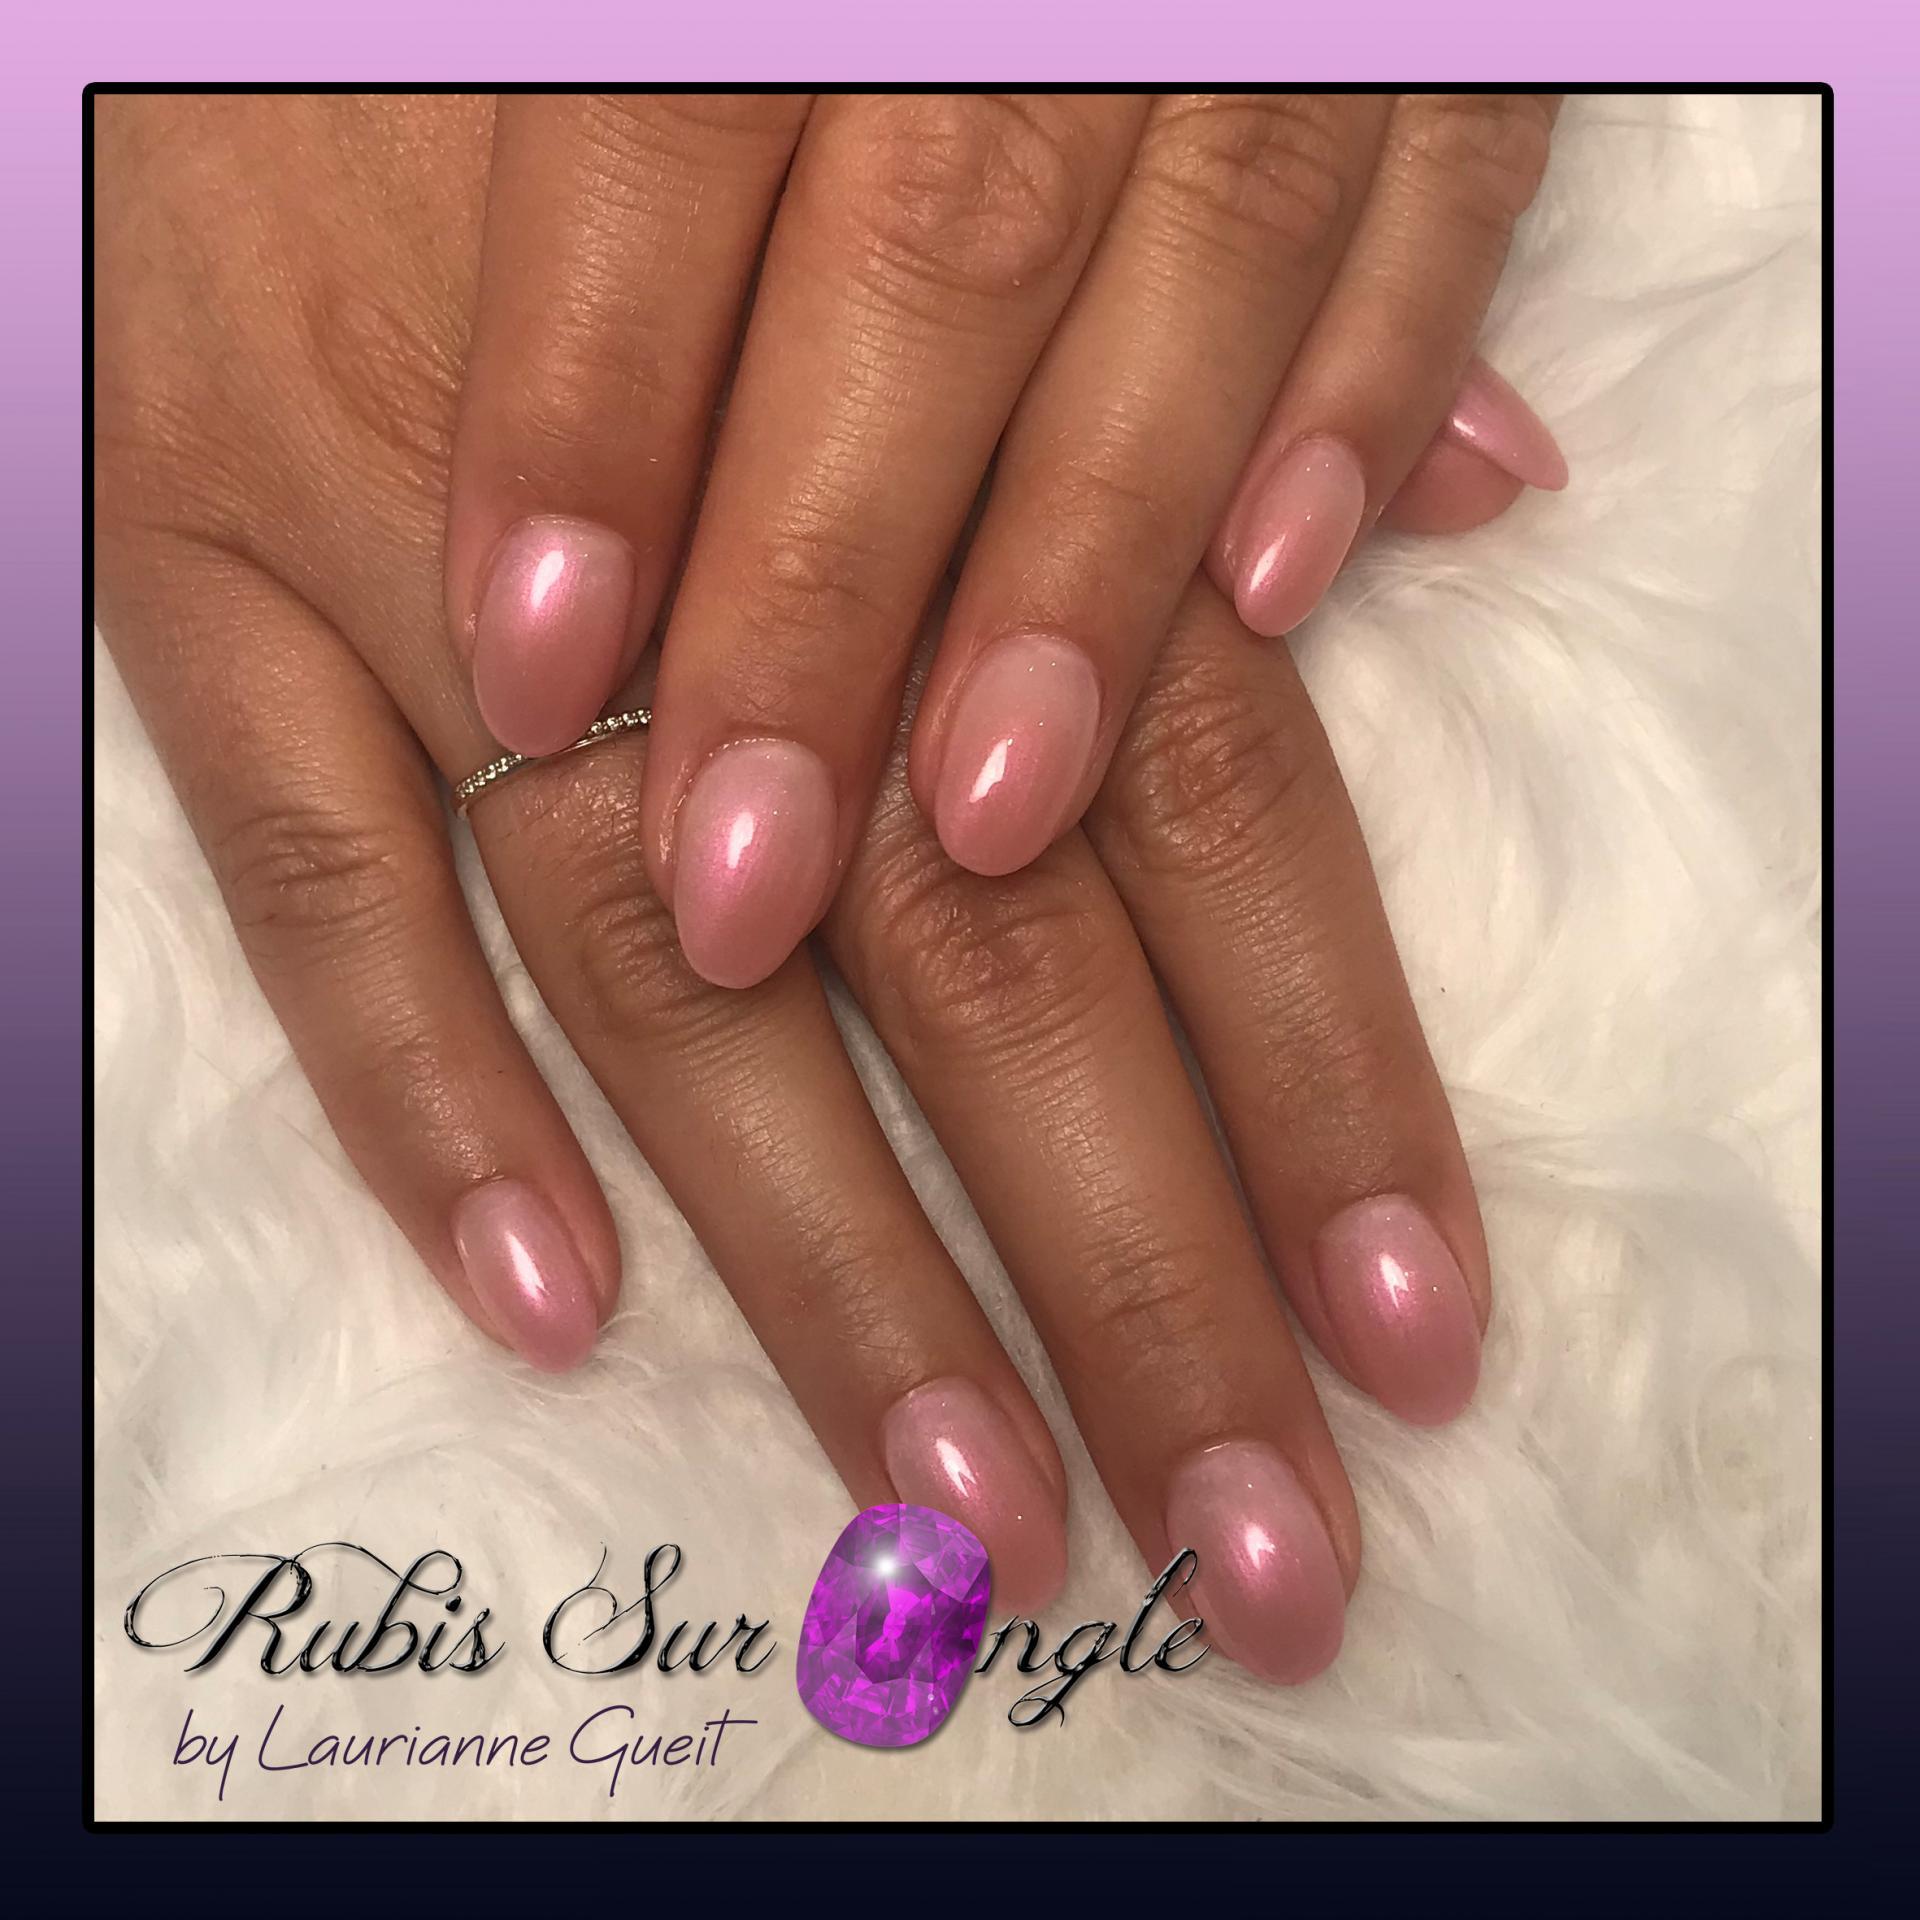 Rubis-Sur-Ongle-Nail-Art-Effet-Perle